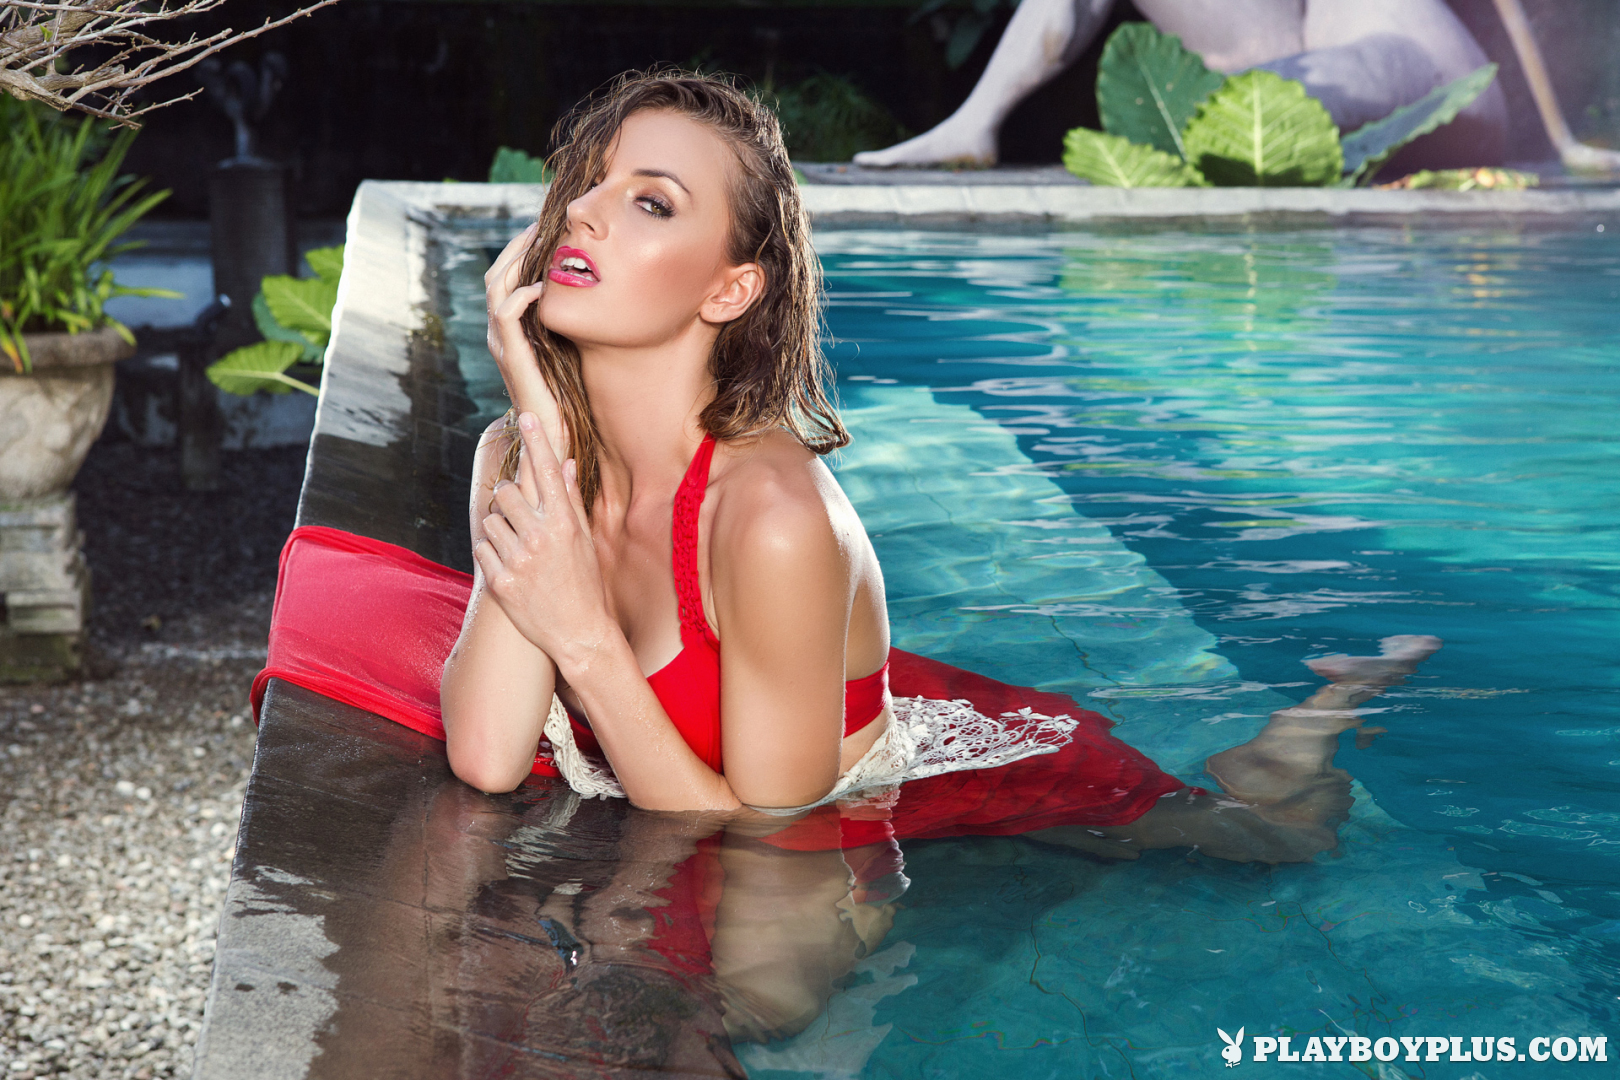 Playboy Cybergirl -Jennifer Love Nude Photos & Videos at Playboy Plus!